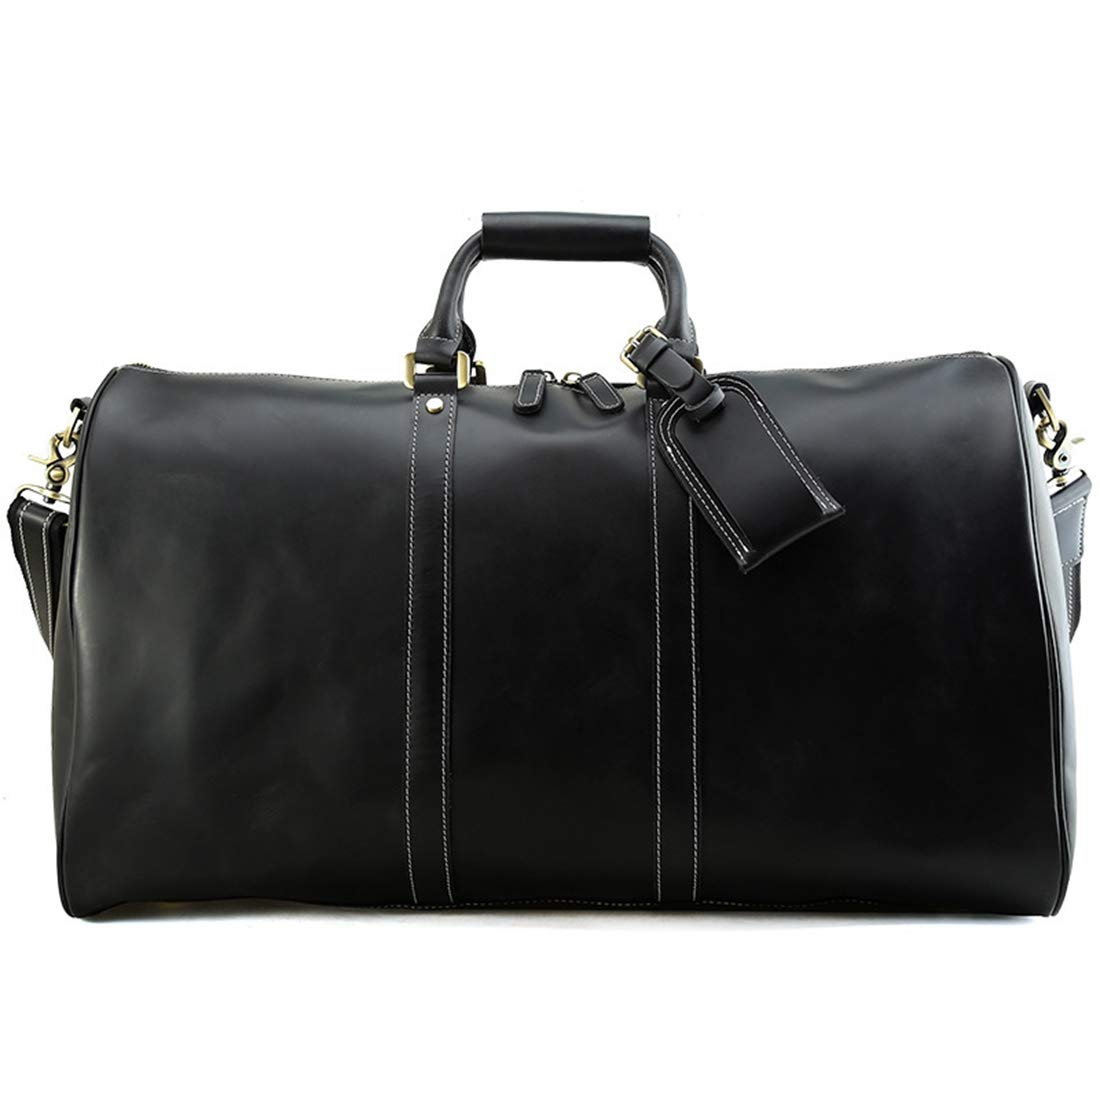 Carriemeow Leather Large-Capacity Bag Portable Mens Leather Shoulder Messenger Bag Long-Distance Travel Bag Weekend Activities Package Color : Black